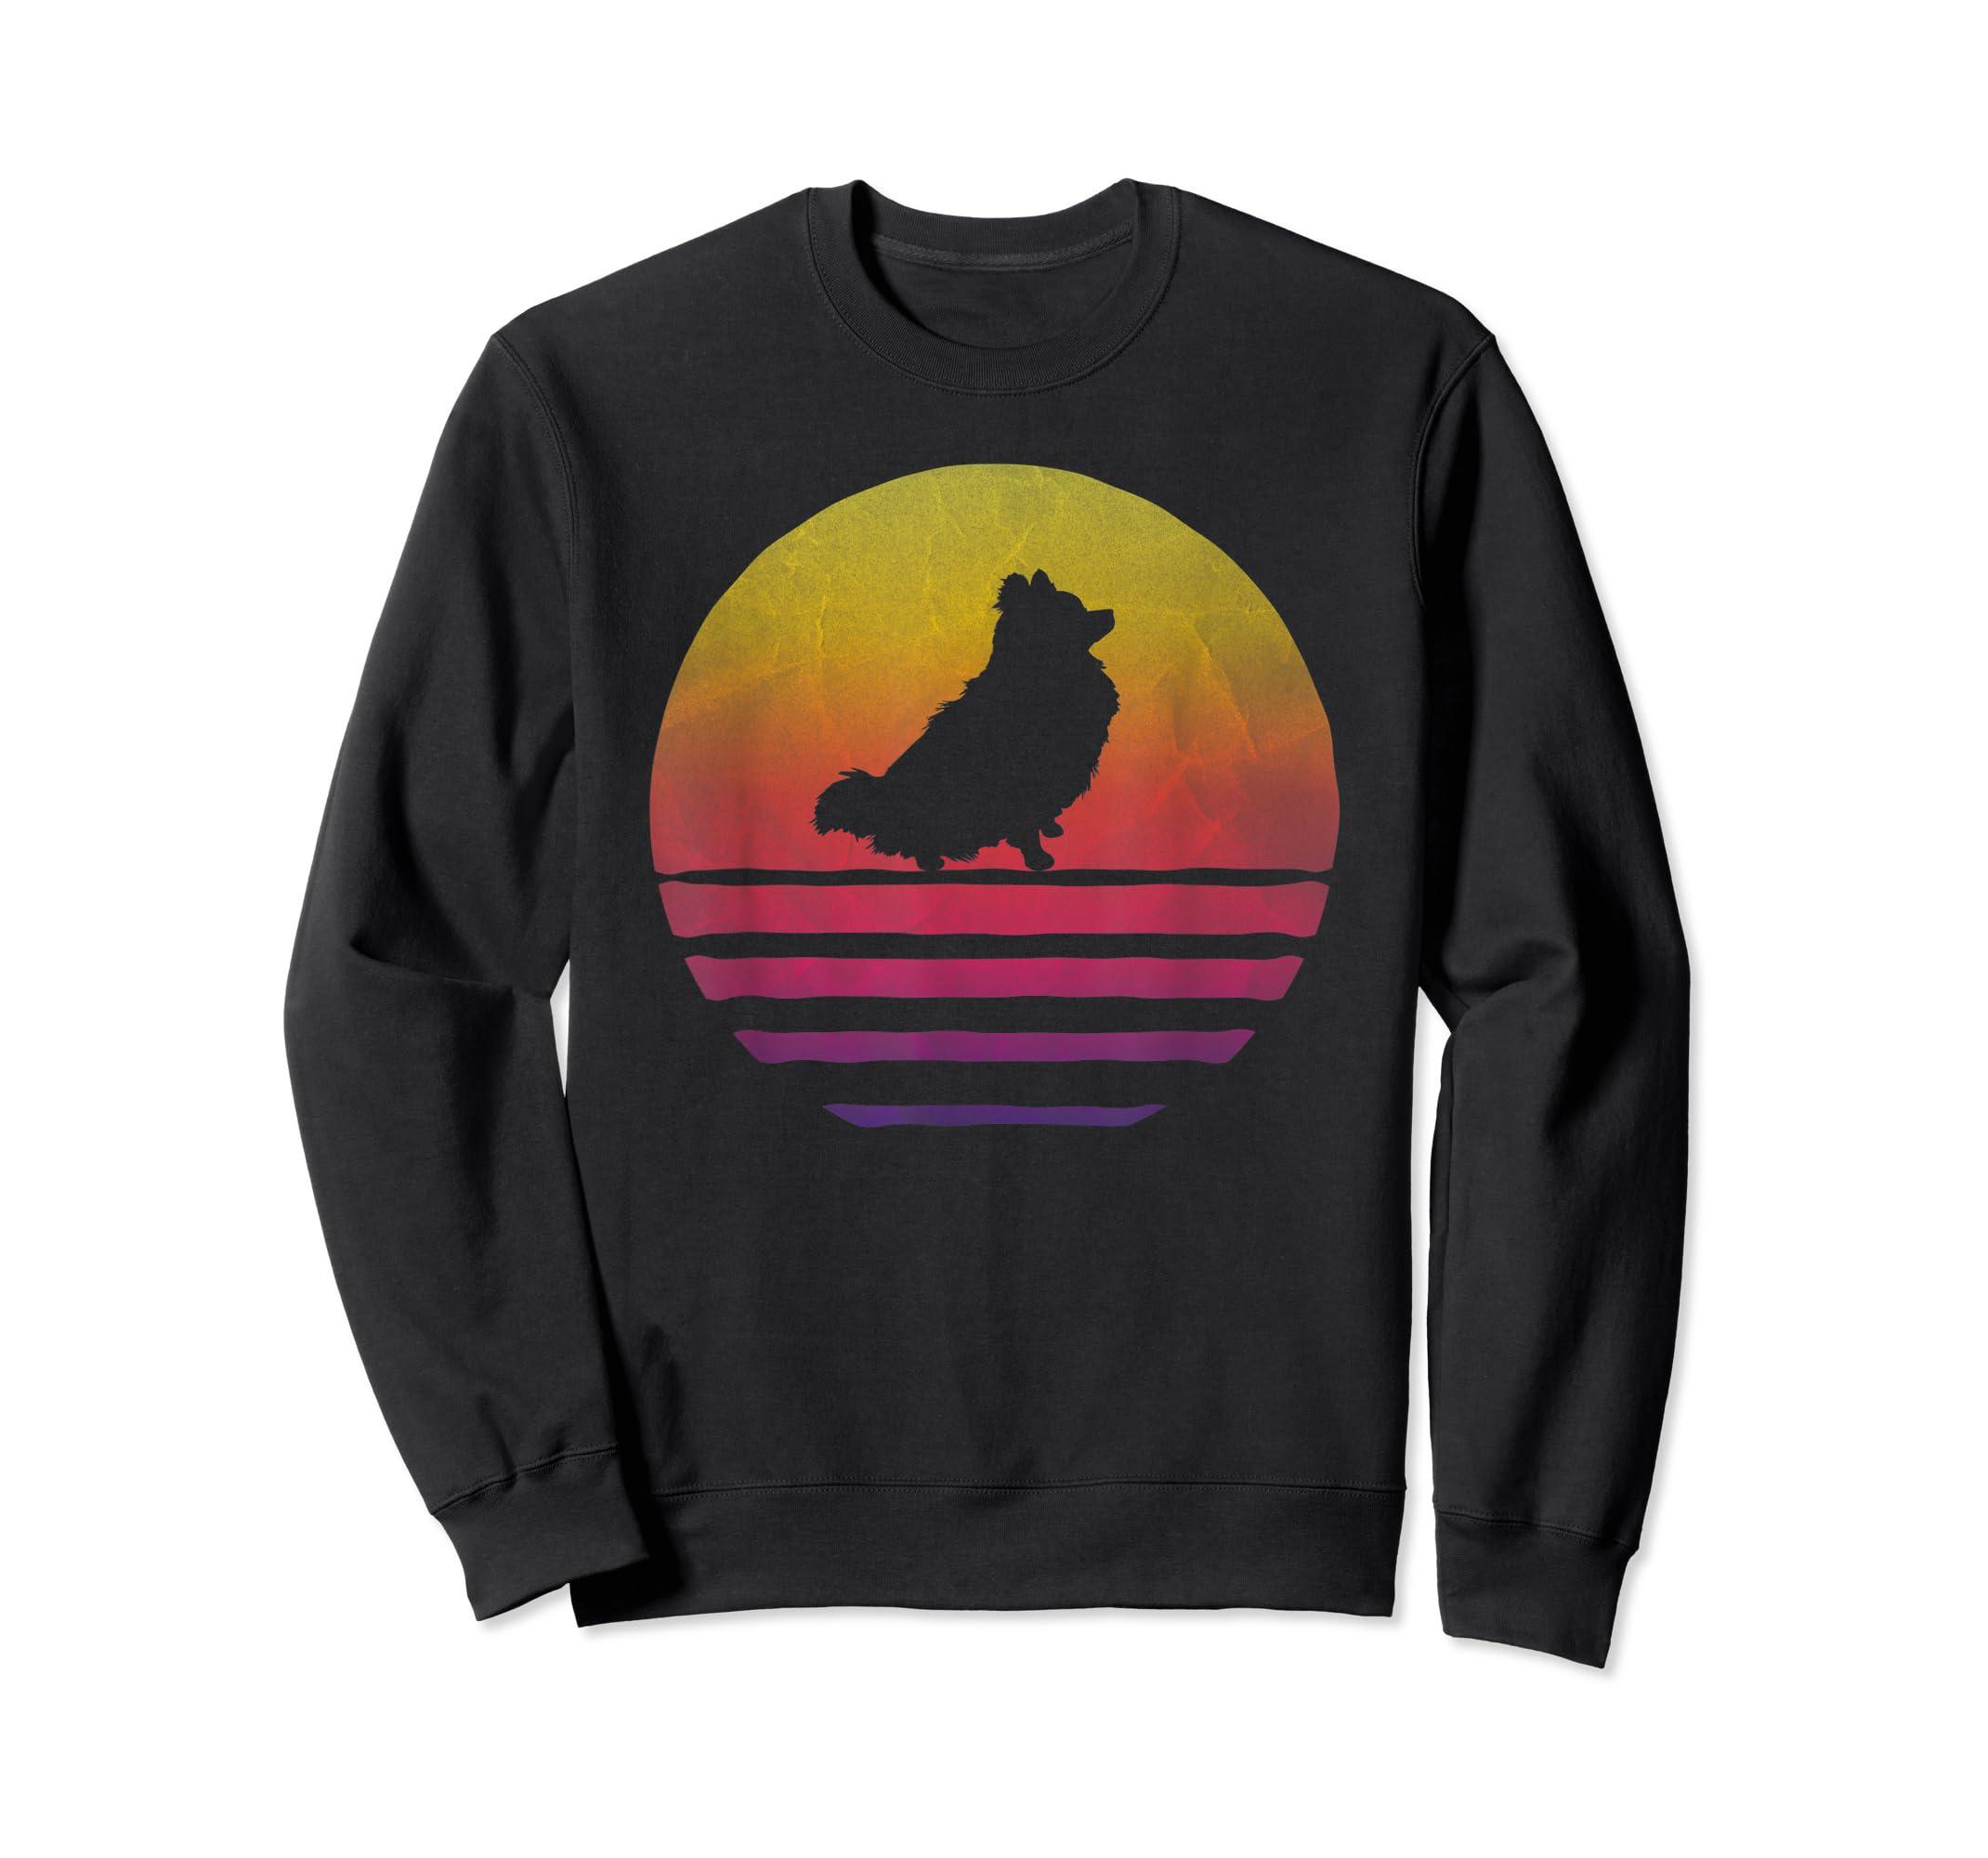 Retro Vintage Sunset Pomeranian Dog Lover Silhouette Gift T-Shirt-Sweatshirt-Black